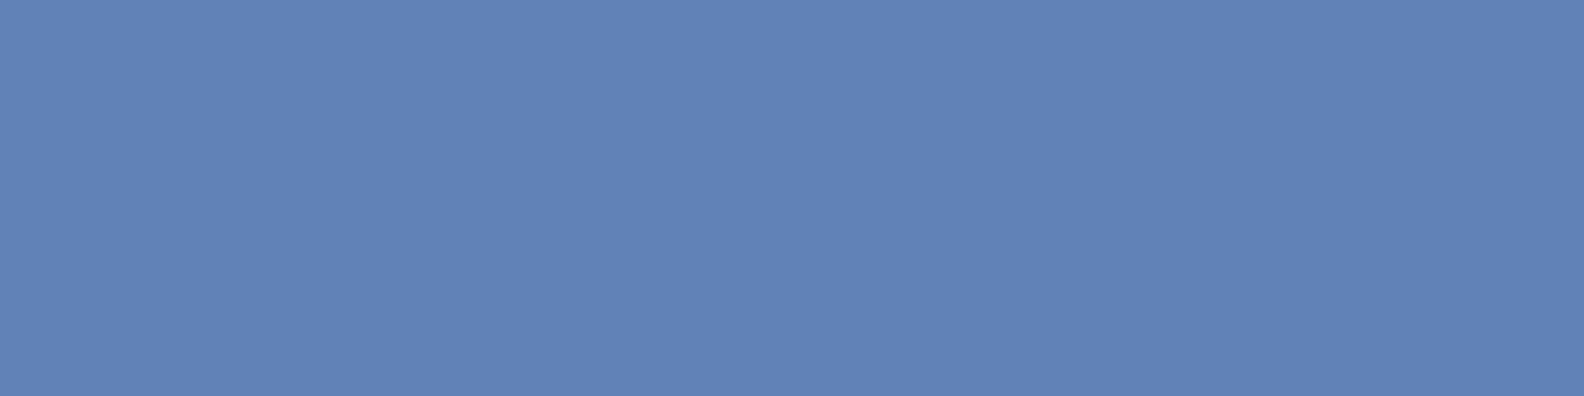 1584x396 Glaucous Solid Color Background